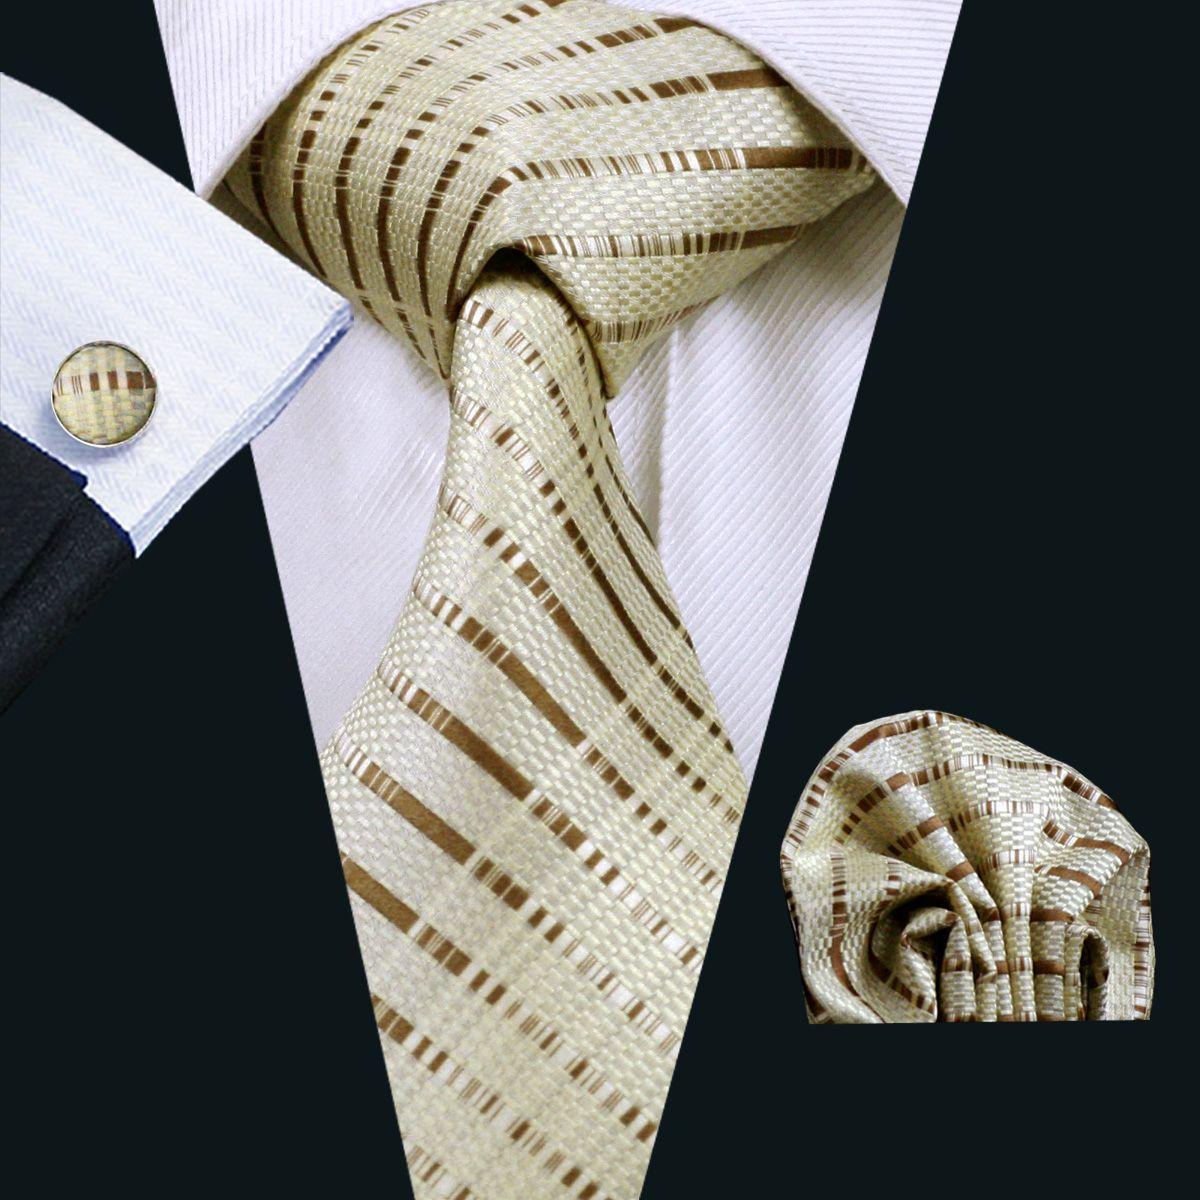 Classic Silk Tie for Men Yellow Hanky Cufflinks Set Mens Jacquard Woven Business Formal Necktie 8.5cm Width Casual Set N-0656